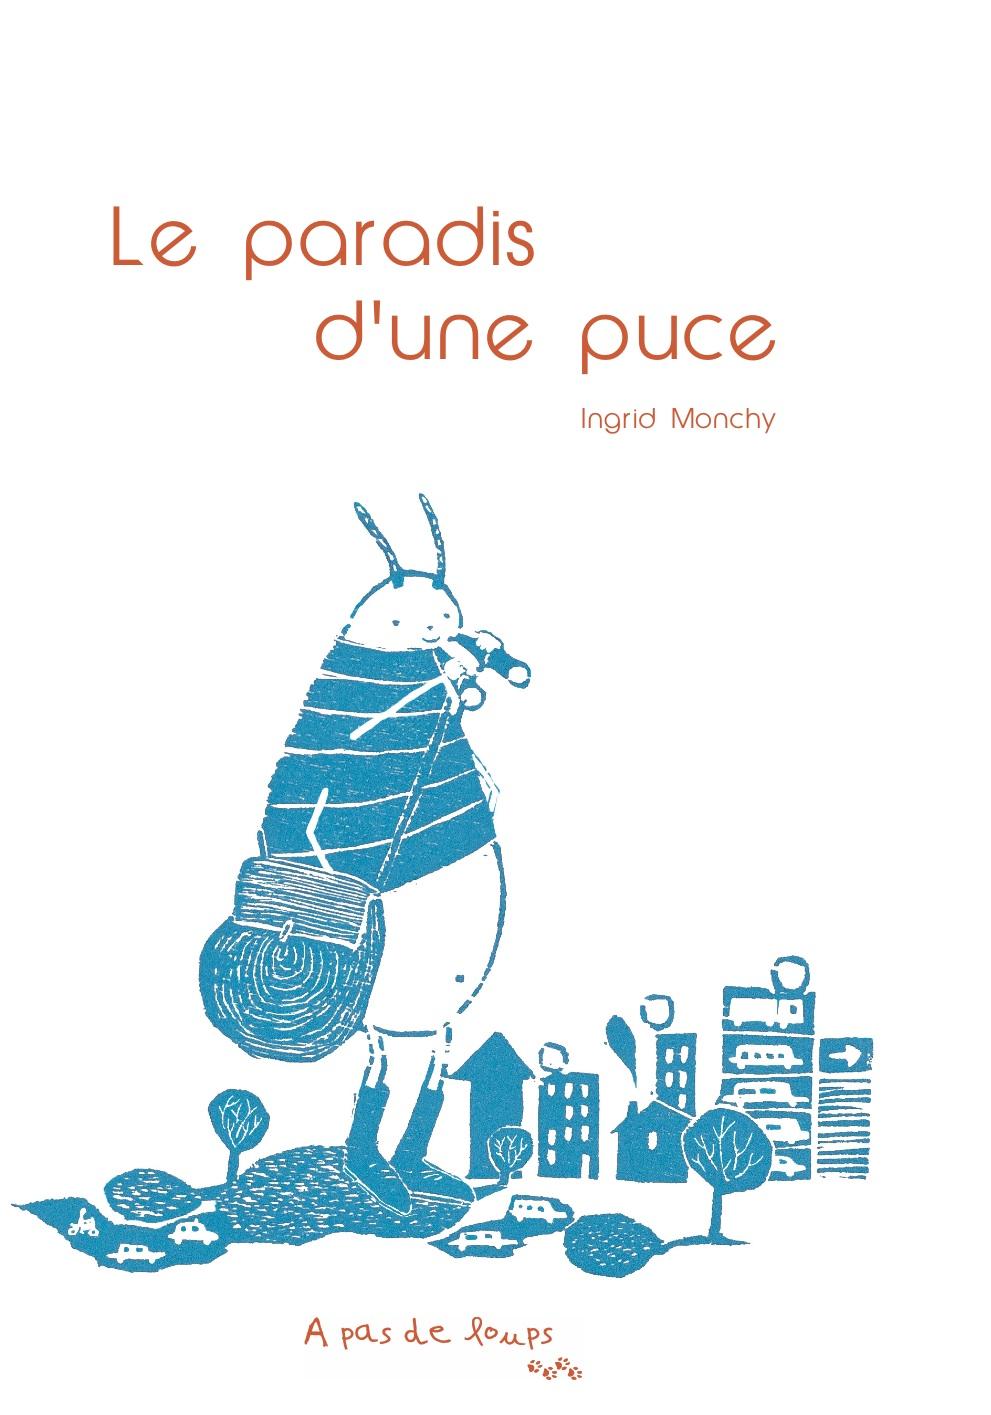 A flea's paradise